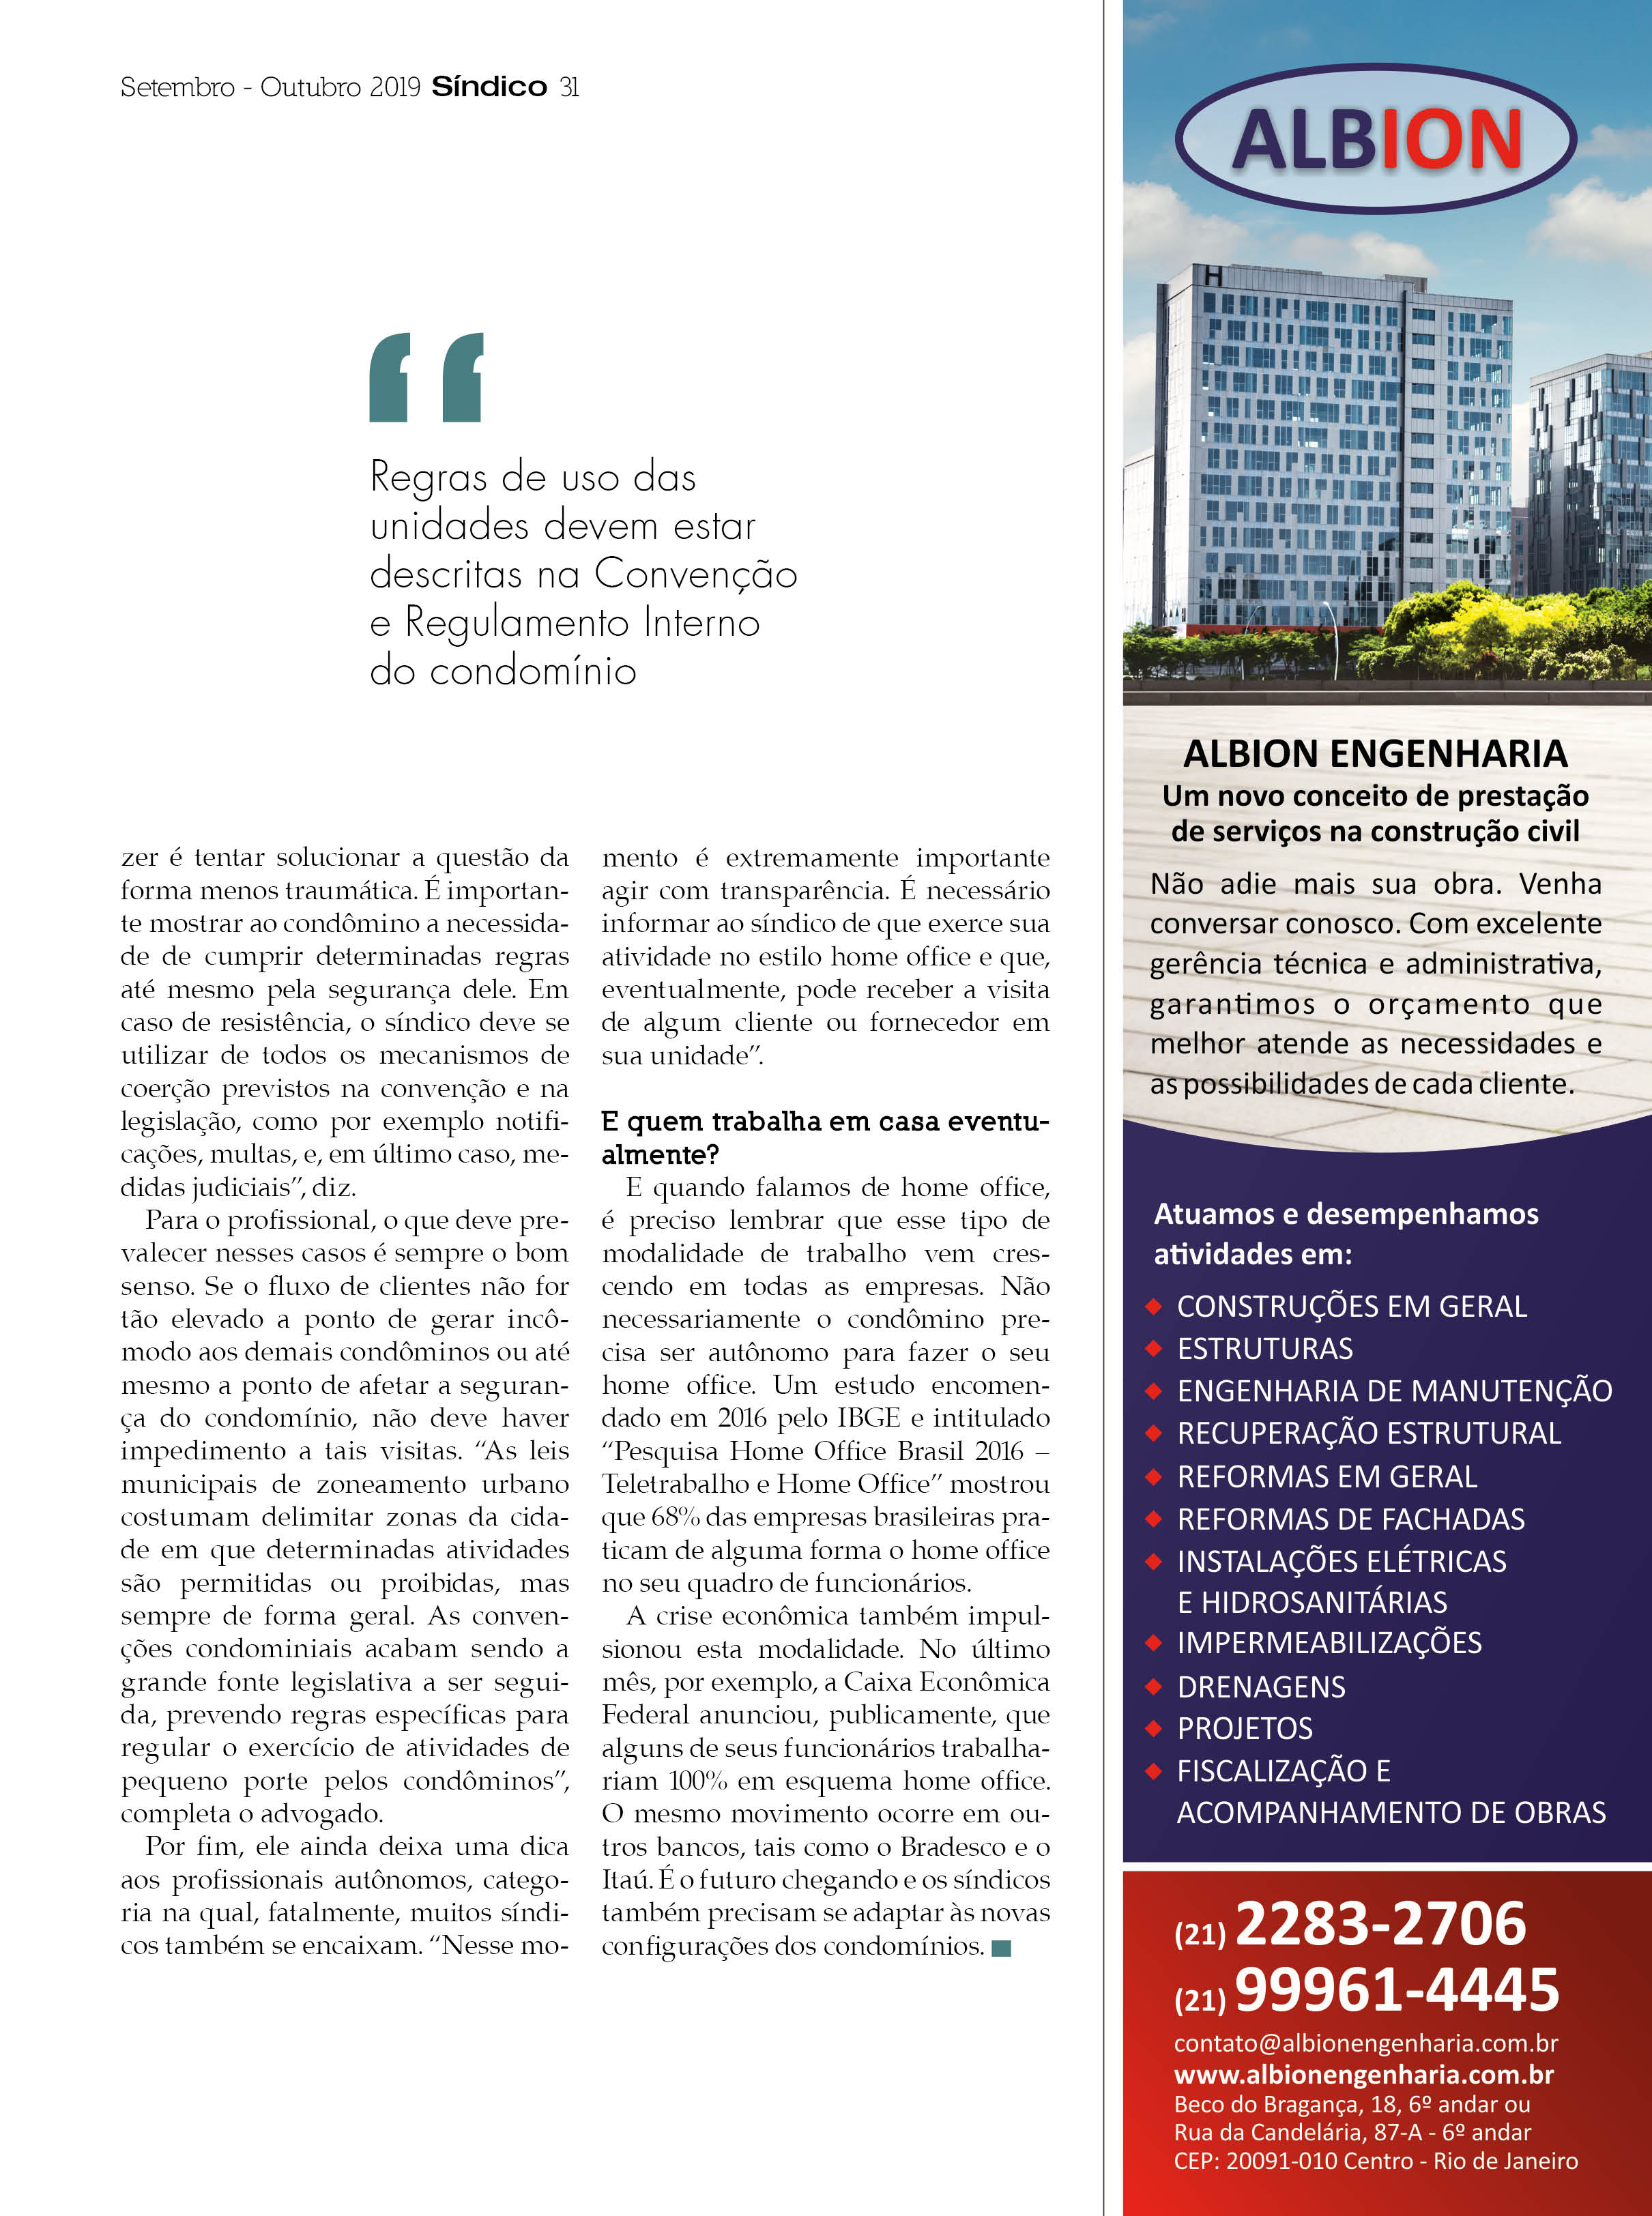 Revista Síndico_ed 246_29